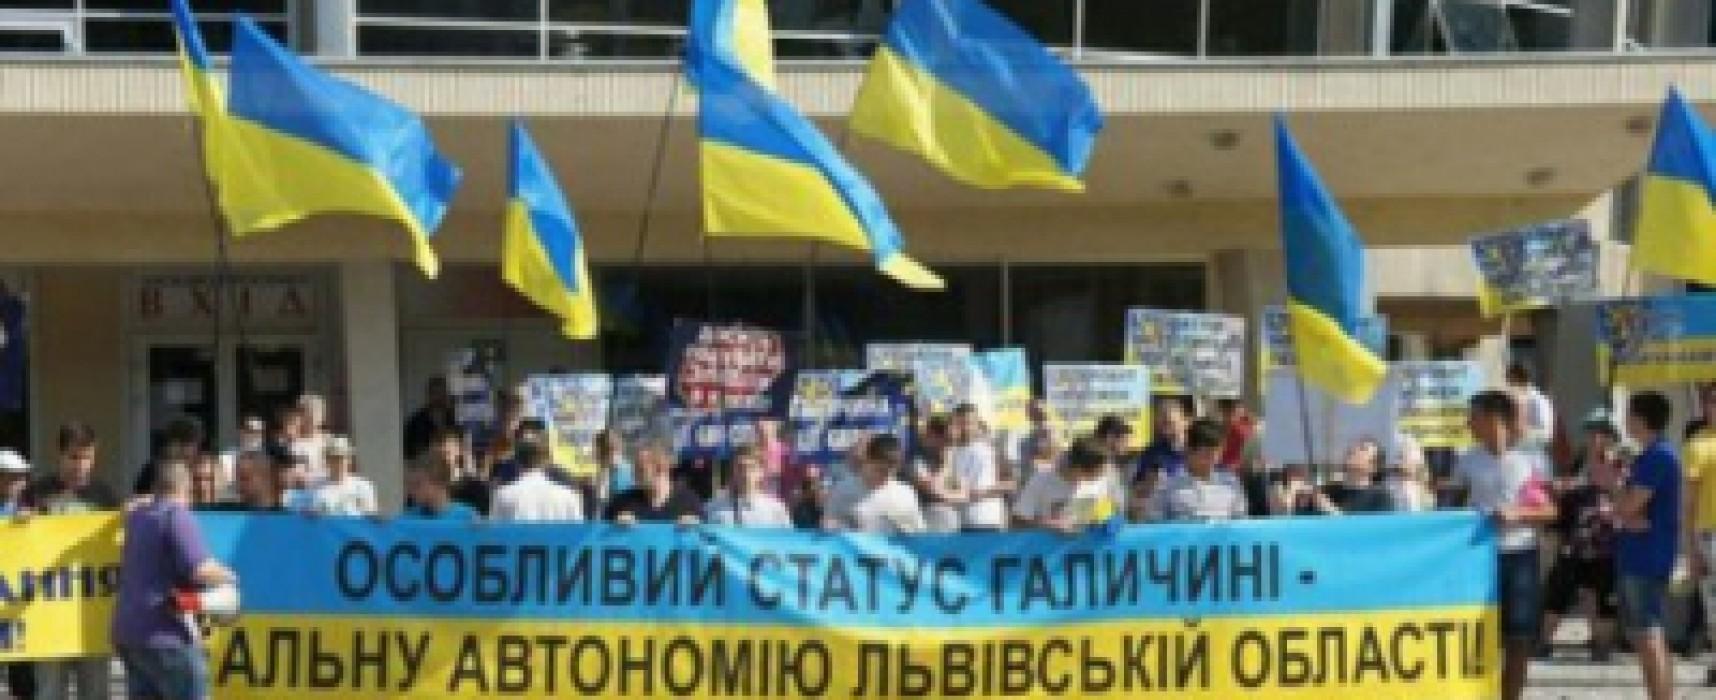 """Separatism"" in Lviv – For Money and Russian Propaganda"